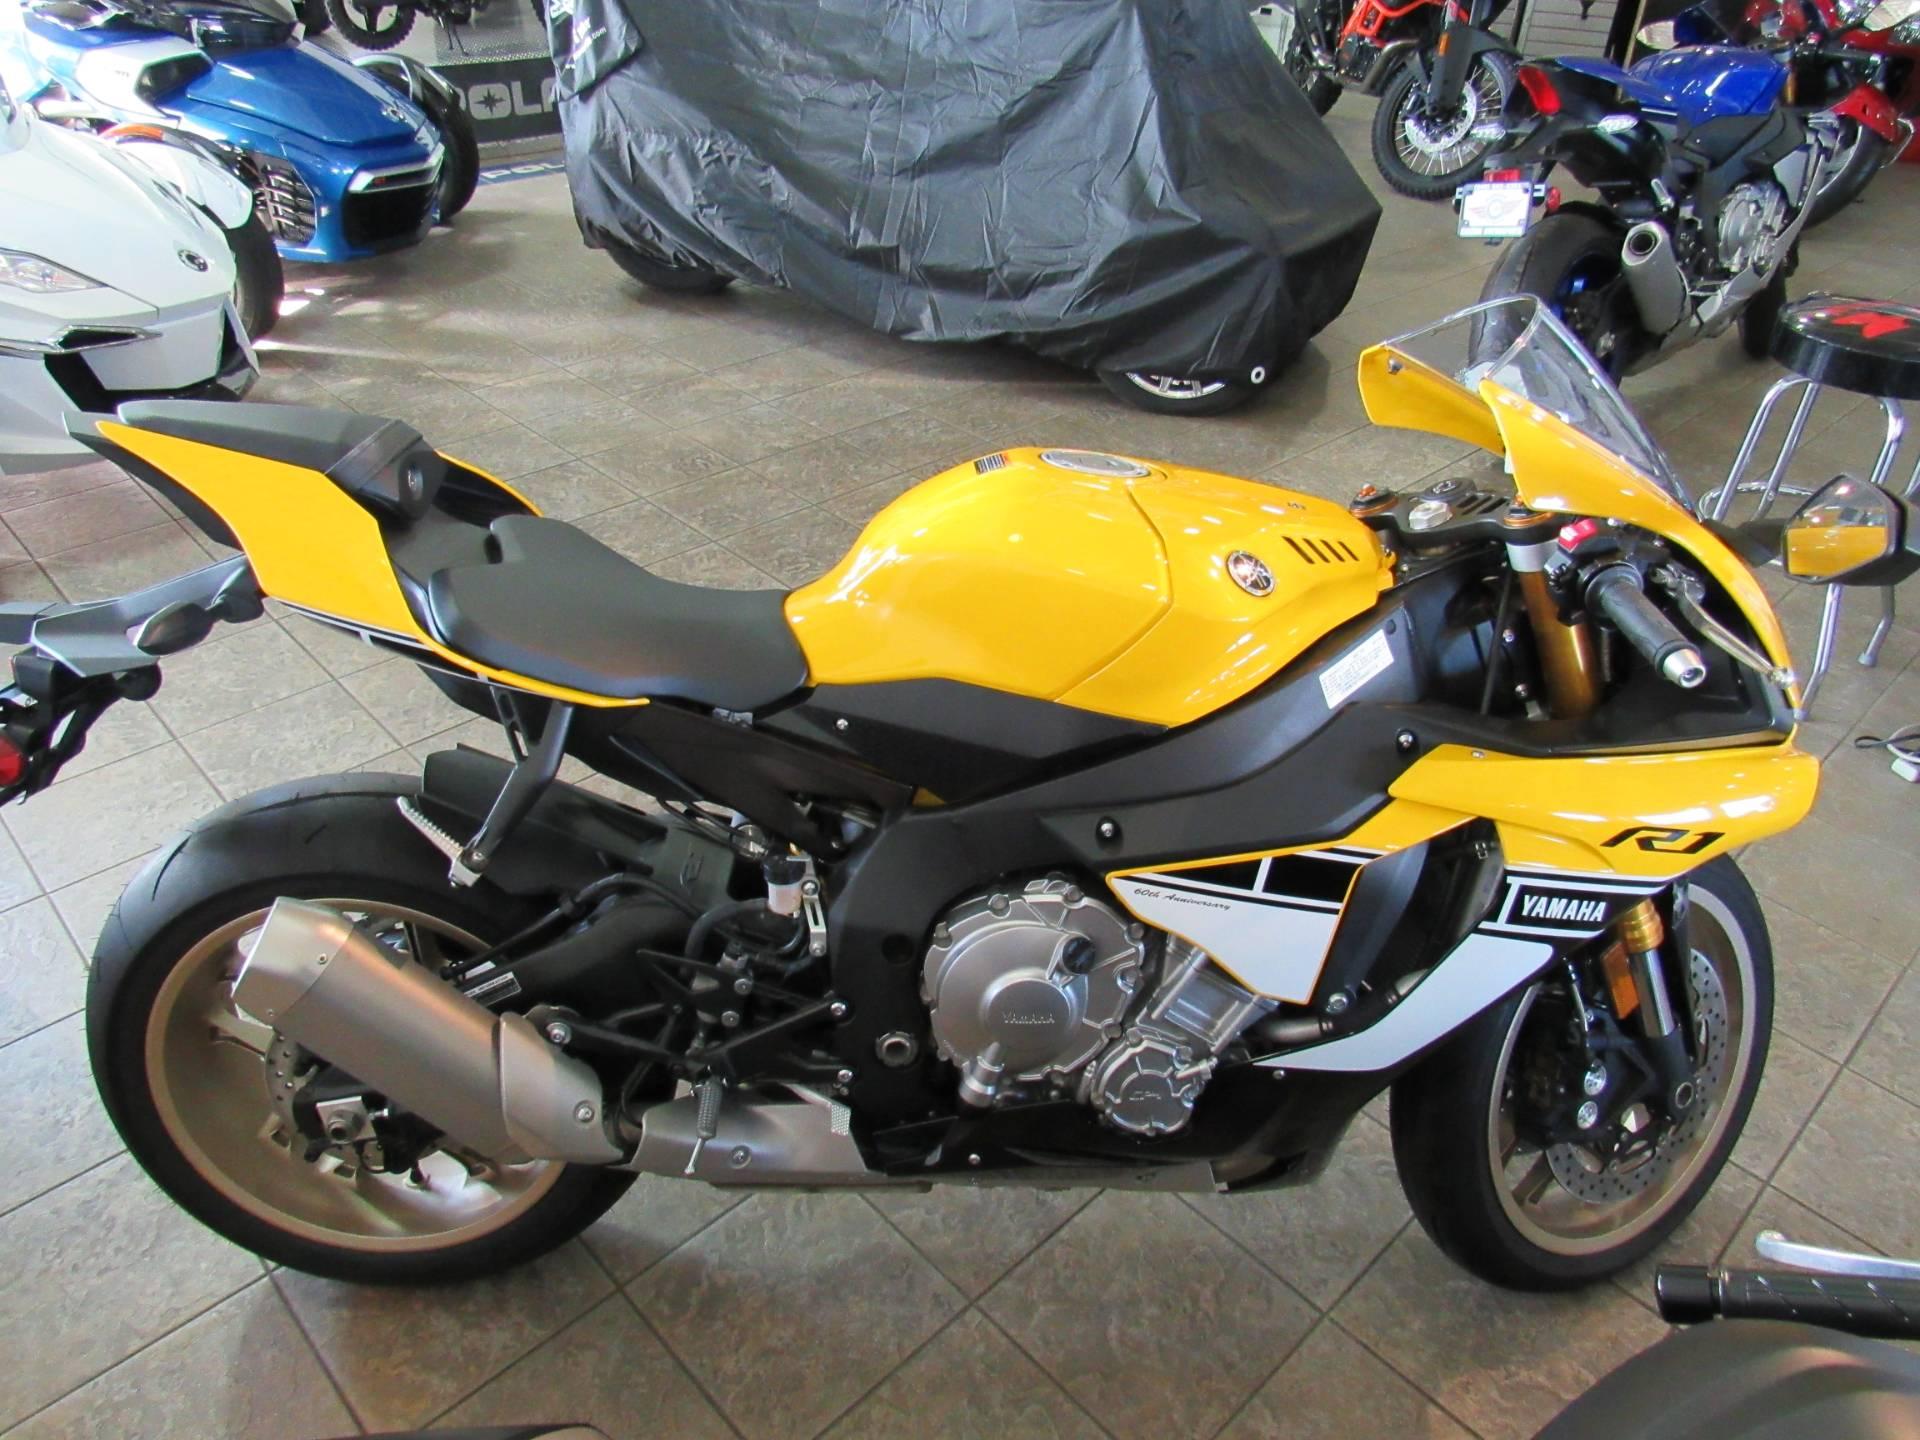 2016 Yamaha YZF-R1 7